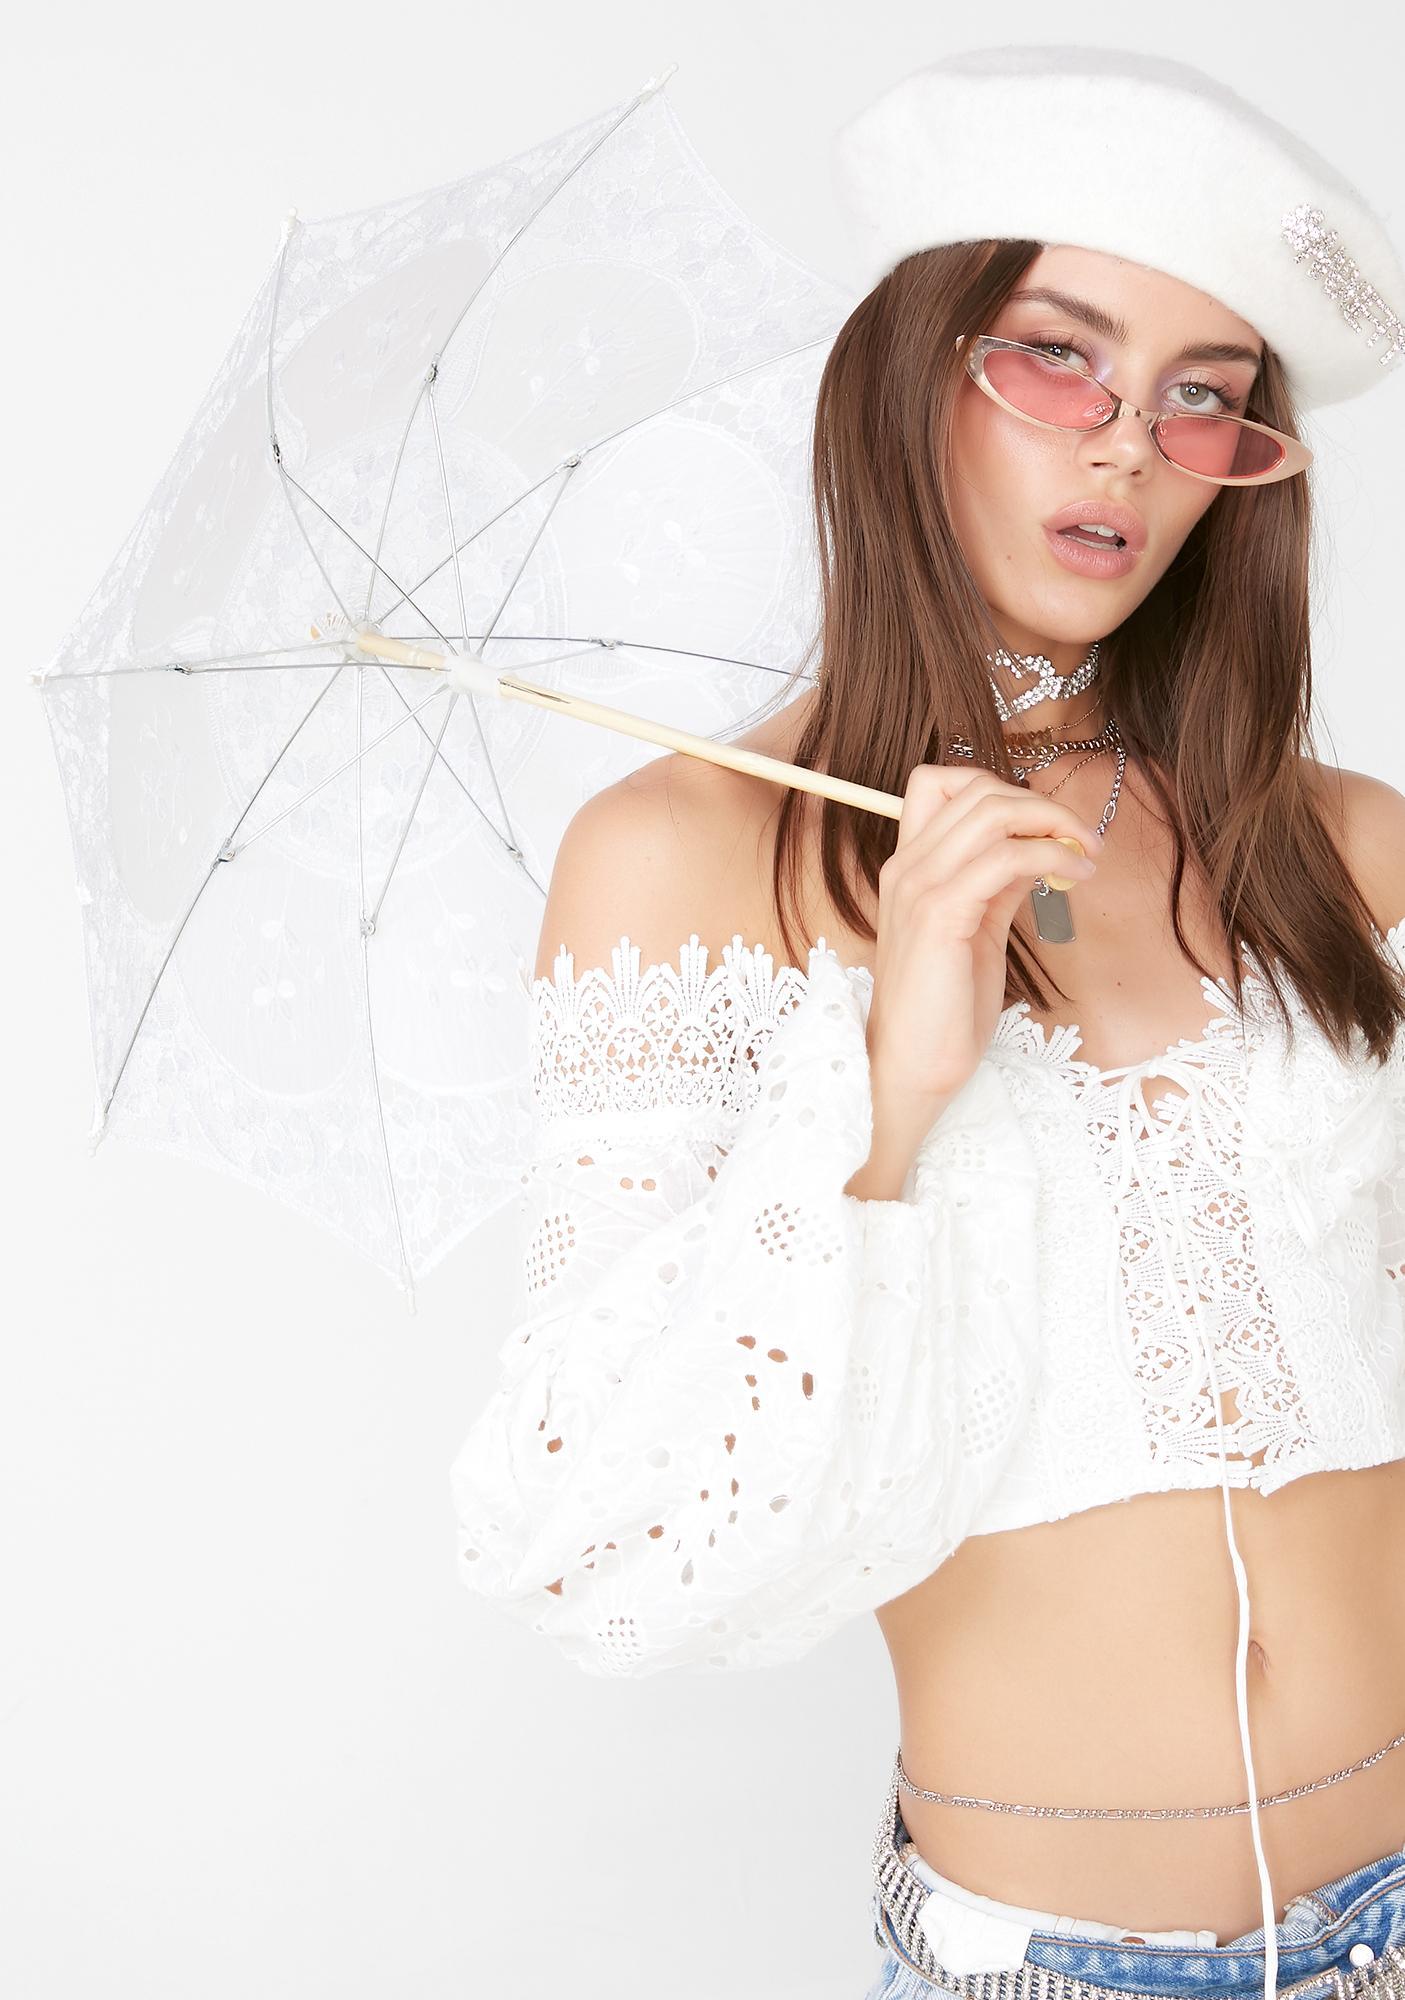 Lolita Livin' Lavish Parisol